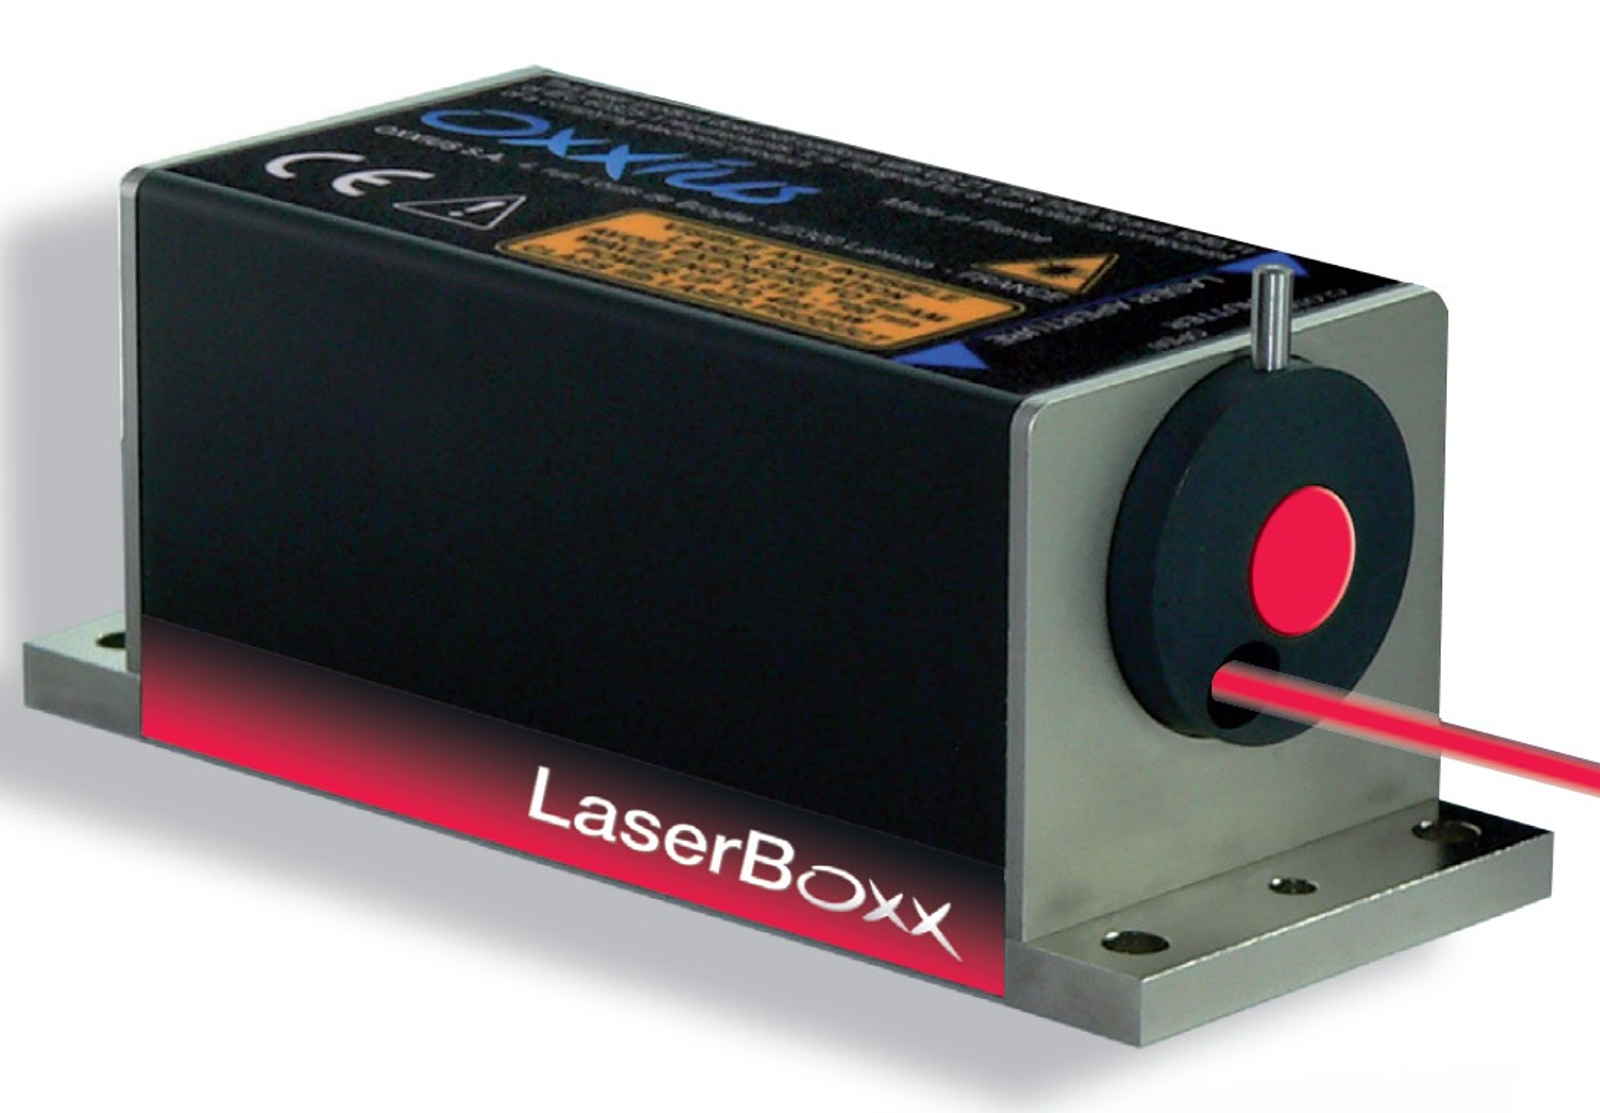 LBX-450-650-HPE